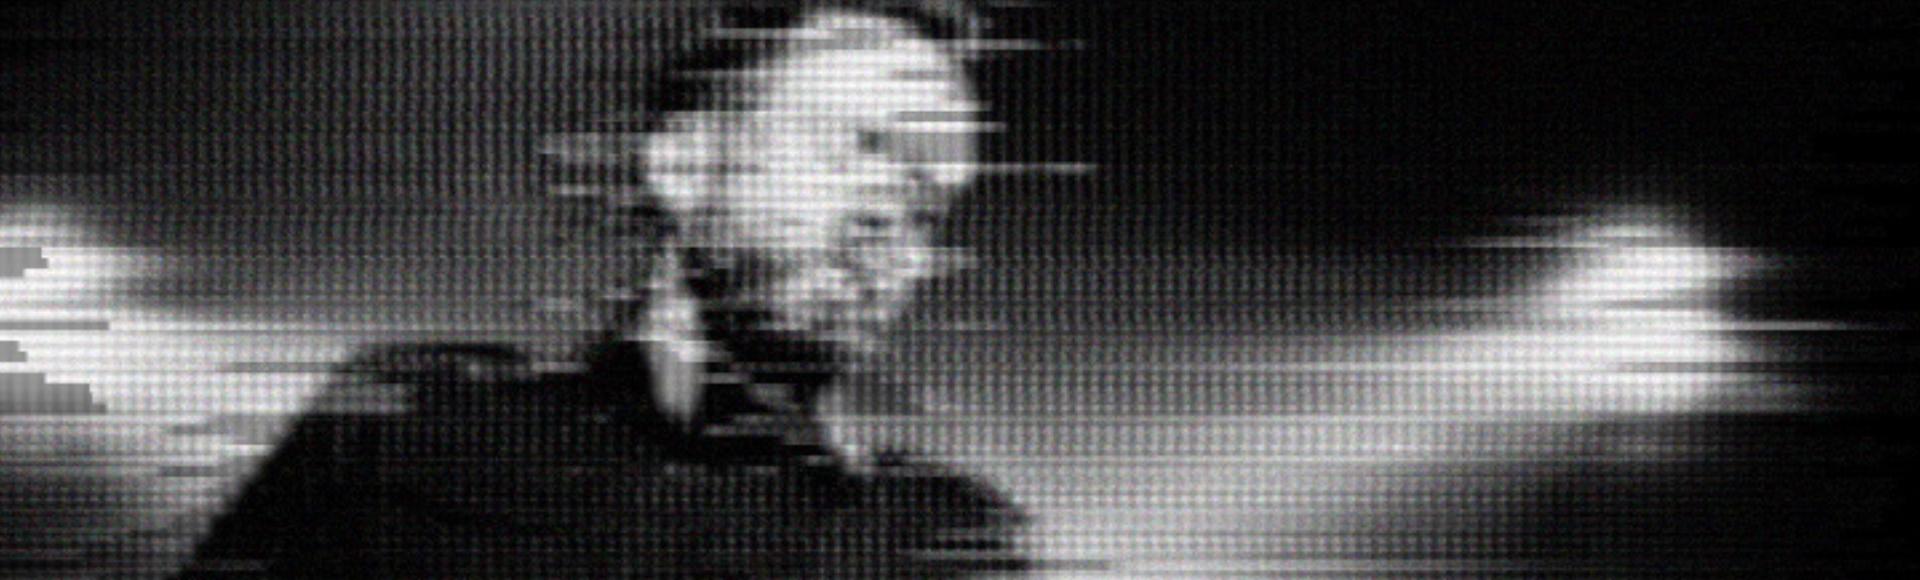 LP_Tsuns (0-00-16-05)_jpgm.jpg